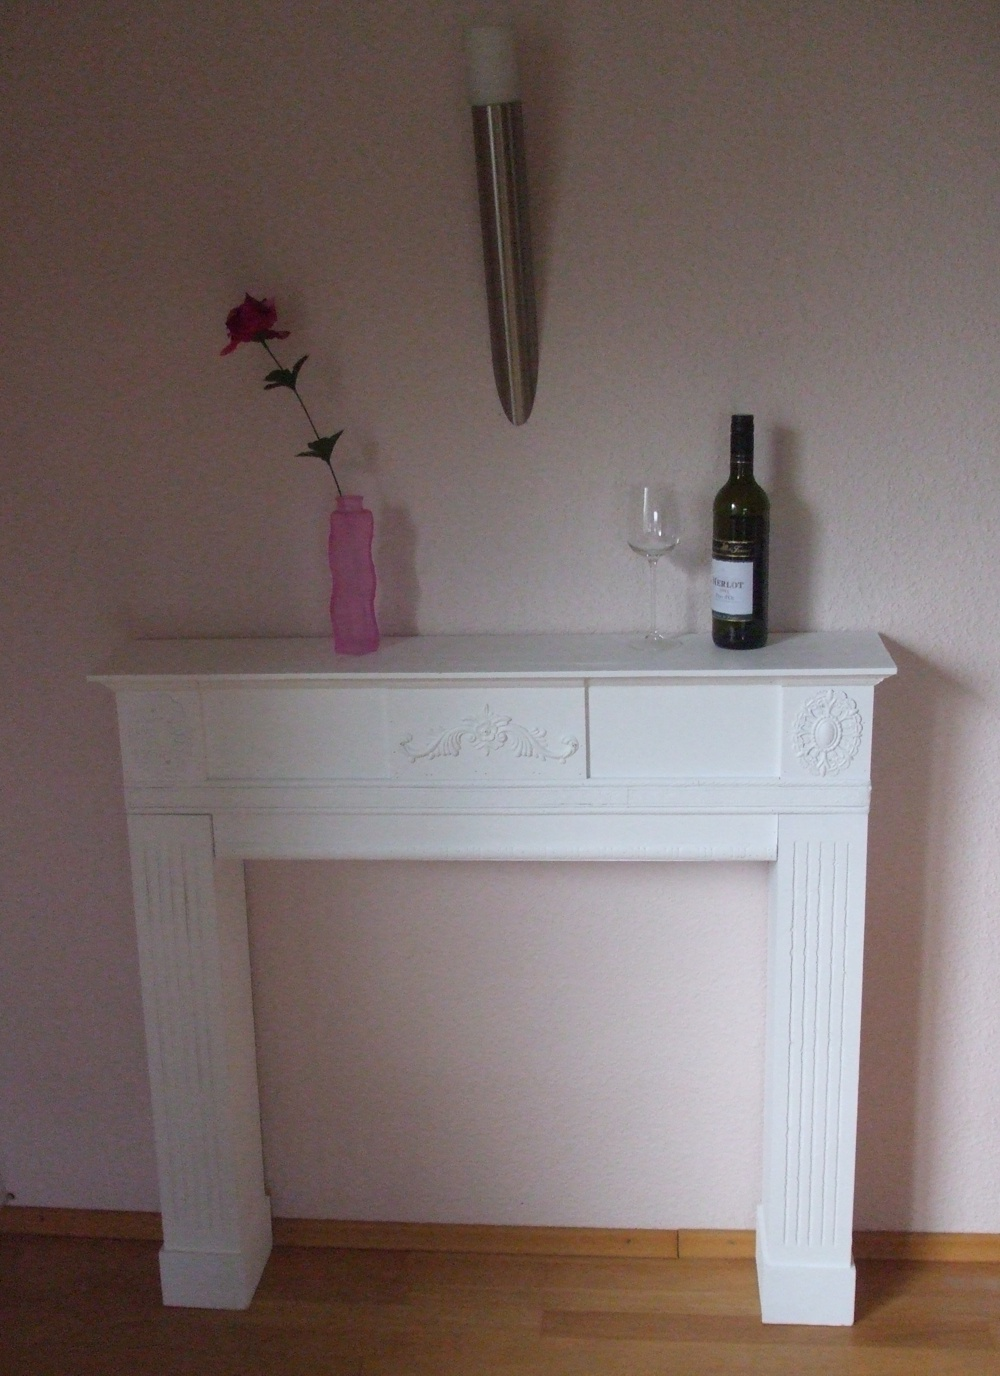 wundersch ne kaminkonsole kaminumrandung wandkonsole. Black Bedroom Furniture Sets. Home Design Ideas